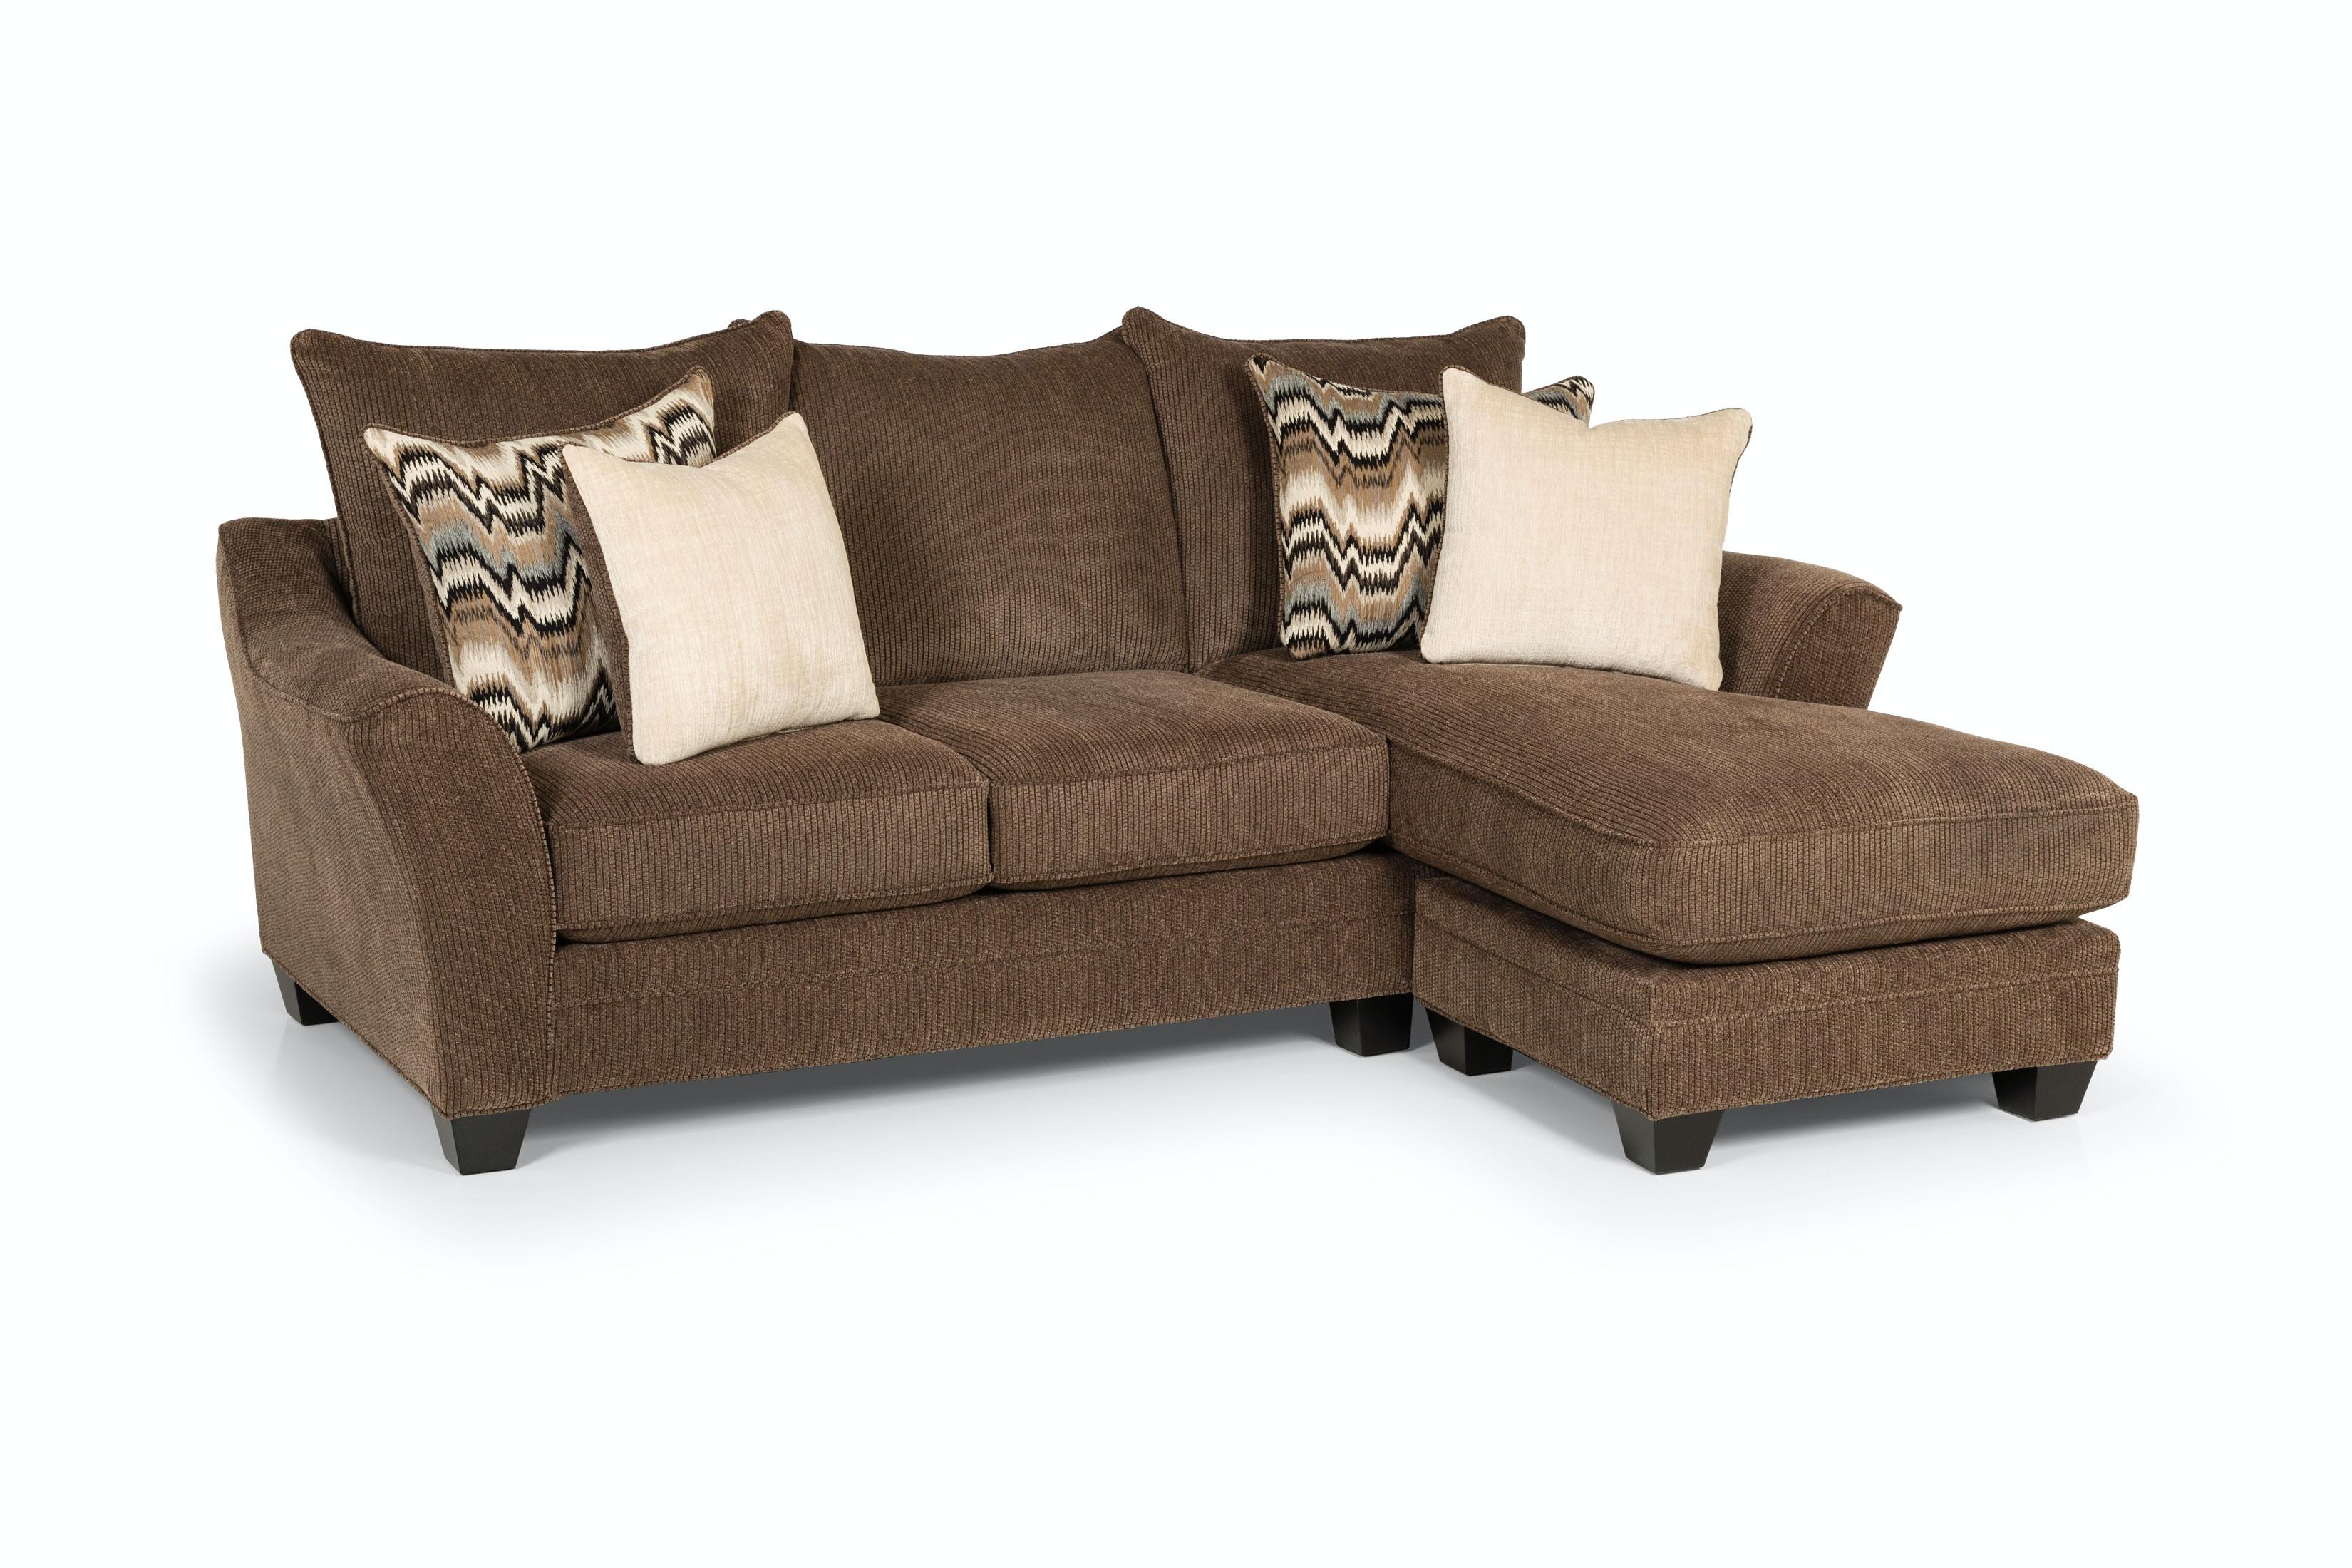 stanton sofa chaise 25733 portland or key home furnishings rh keyhomefurnishings com sectionals portland oregon sectionals portland oregon